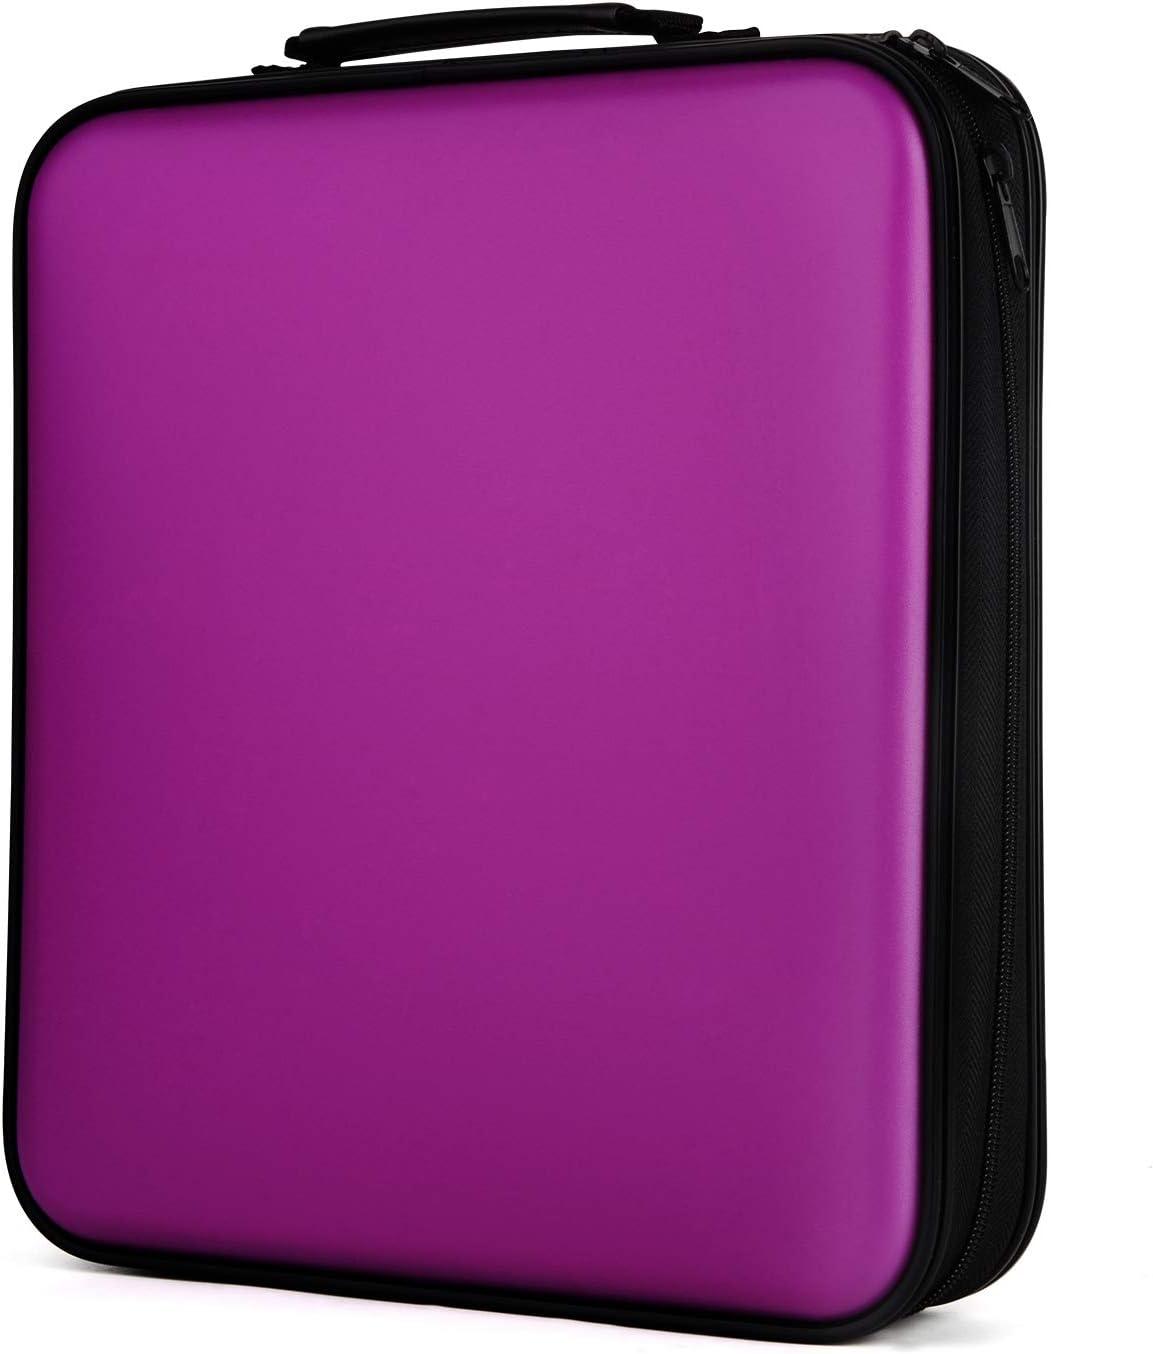 COOFIT CD Case, 160 Capacity DVD Storage DVD Case VCD Wallets Storage Organizer Flexible Plastic Protective DVD Storage Purple